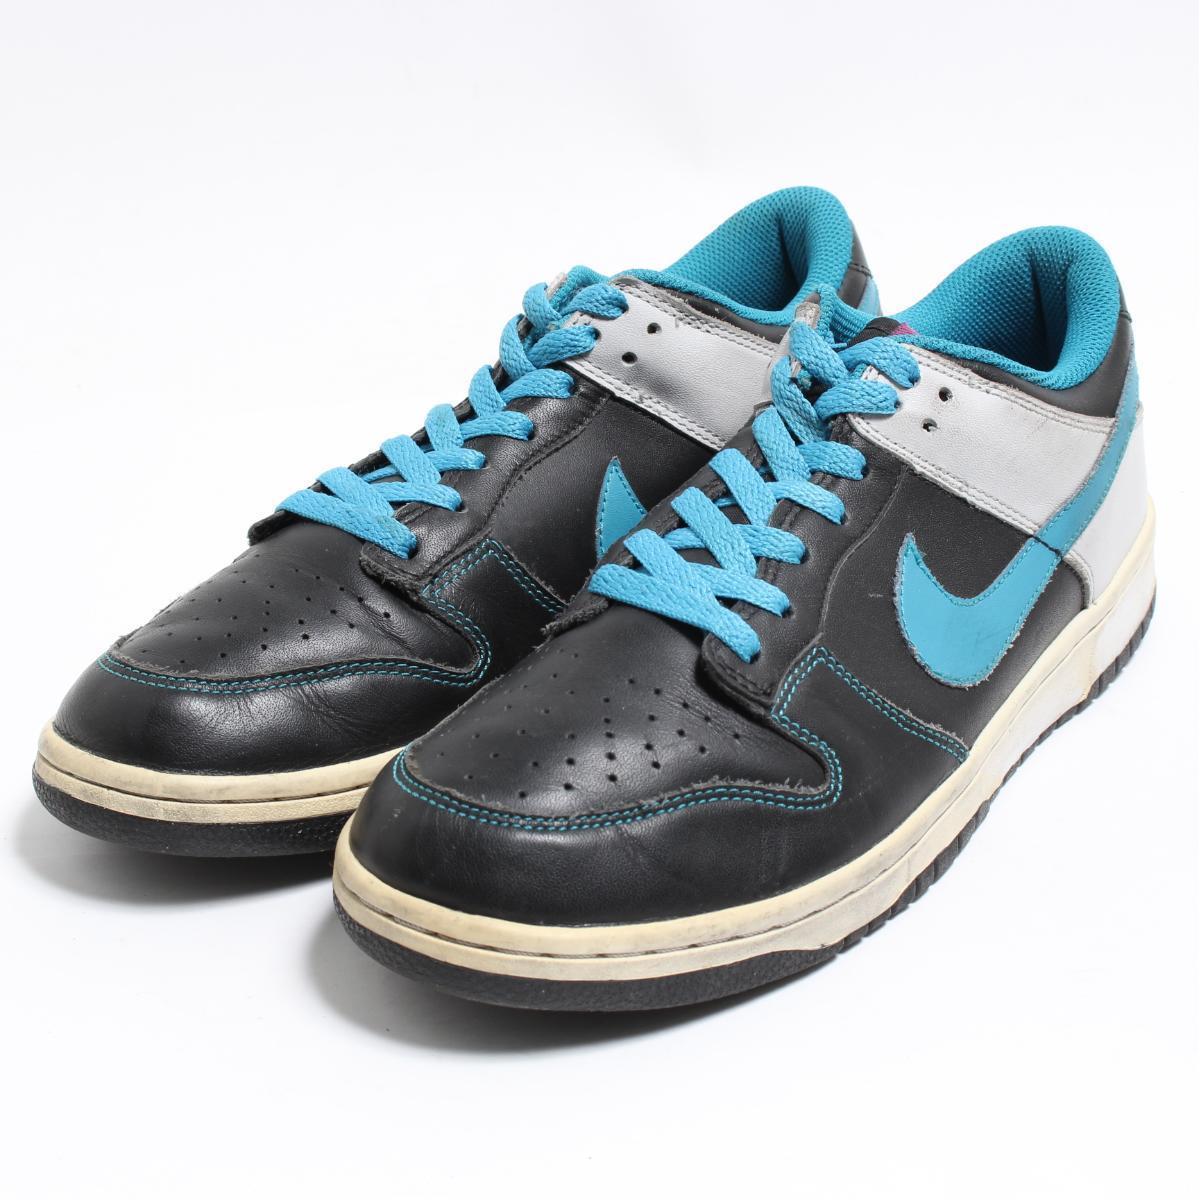 best service 777b8 e7738 Nike NIKE DUNK LOW sneakers US9 .5 men's 27.5cm /bon5307